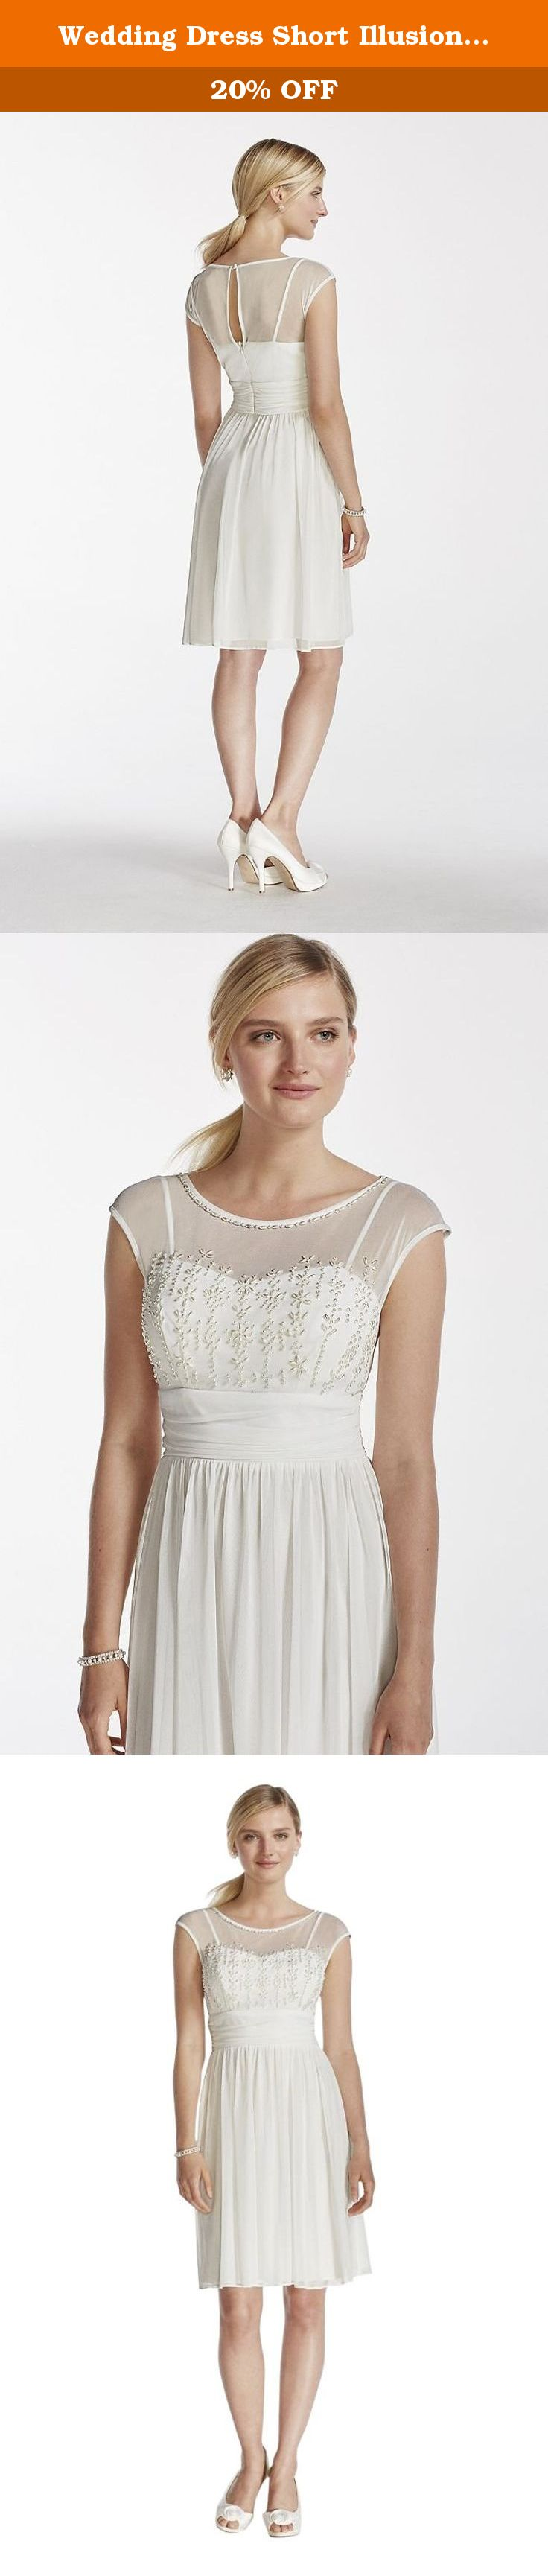 Wedding dress short illusion cap sleeve mesh with pearl beading